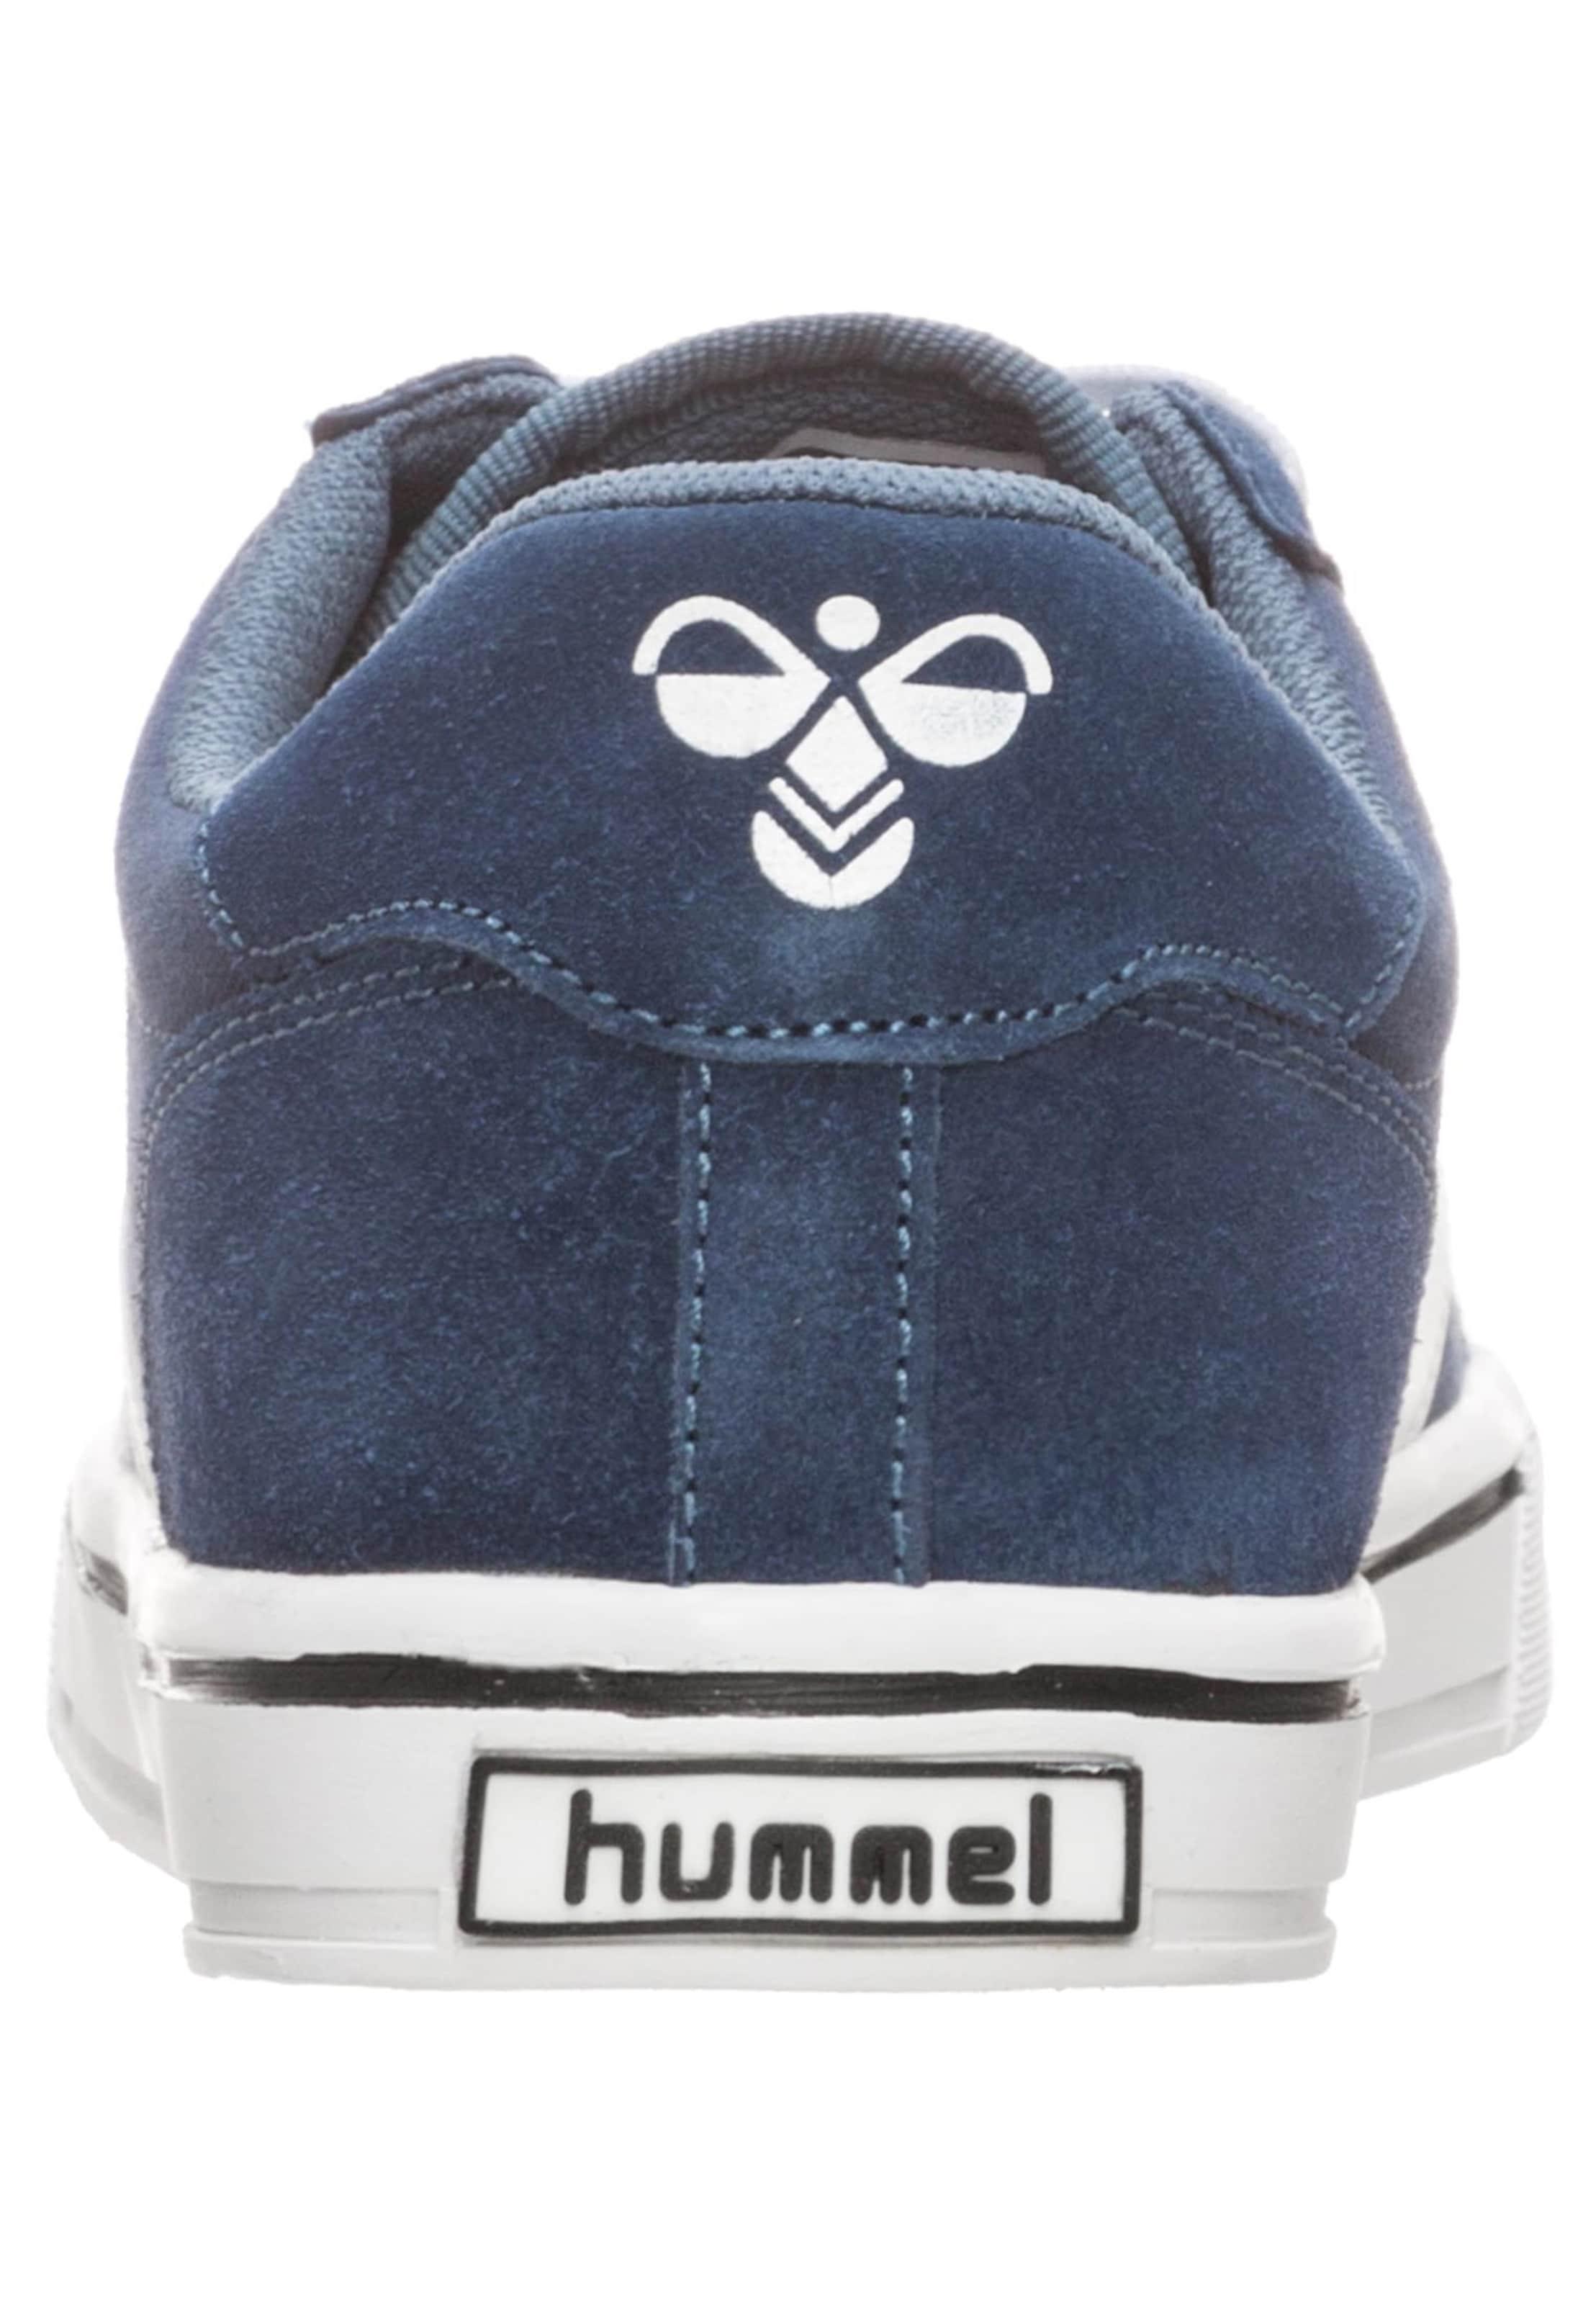 'nile' Sneaker Sneaker Hummel Violettblau In Violettblau In Hummel 'nile' dBCoQerxW